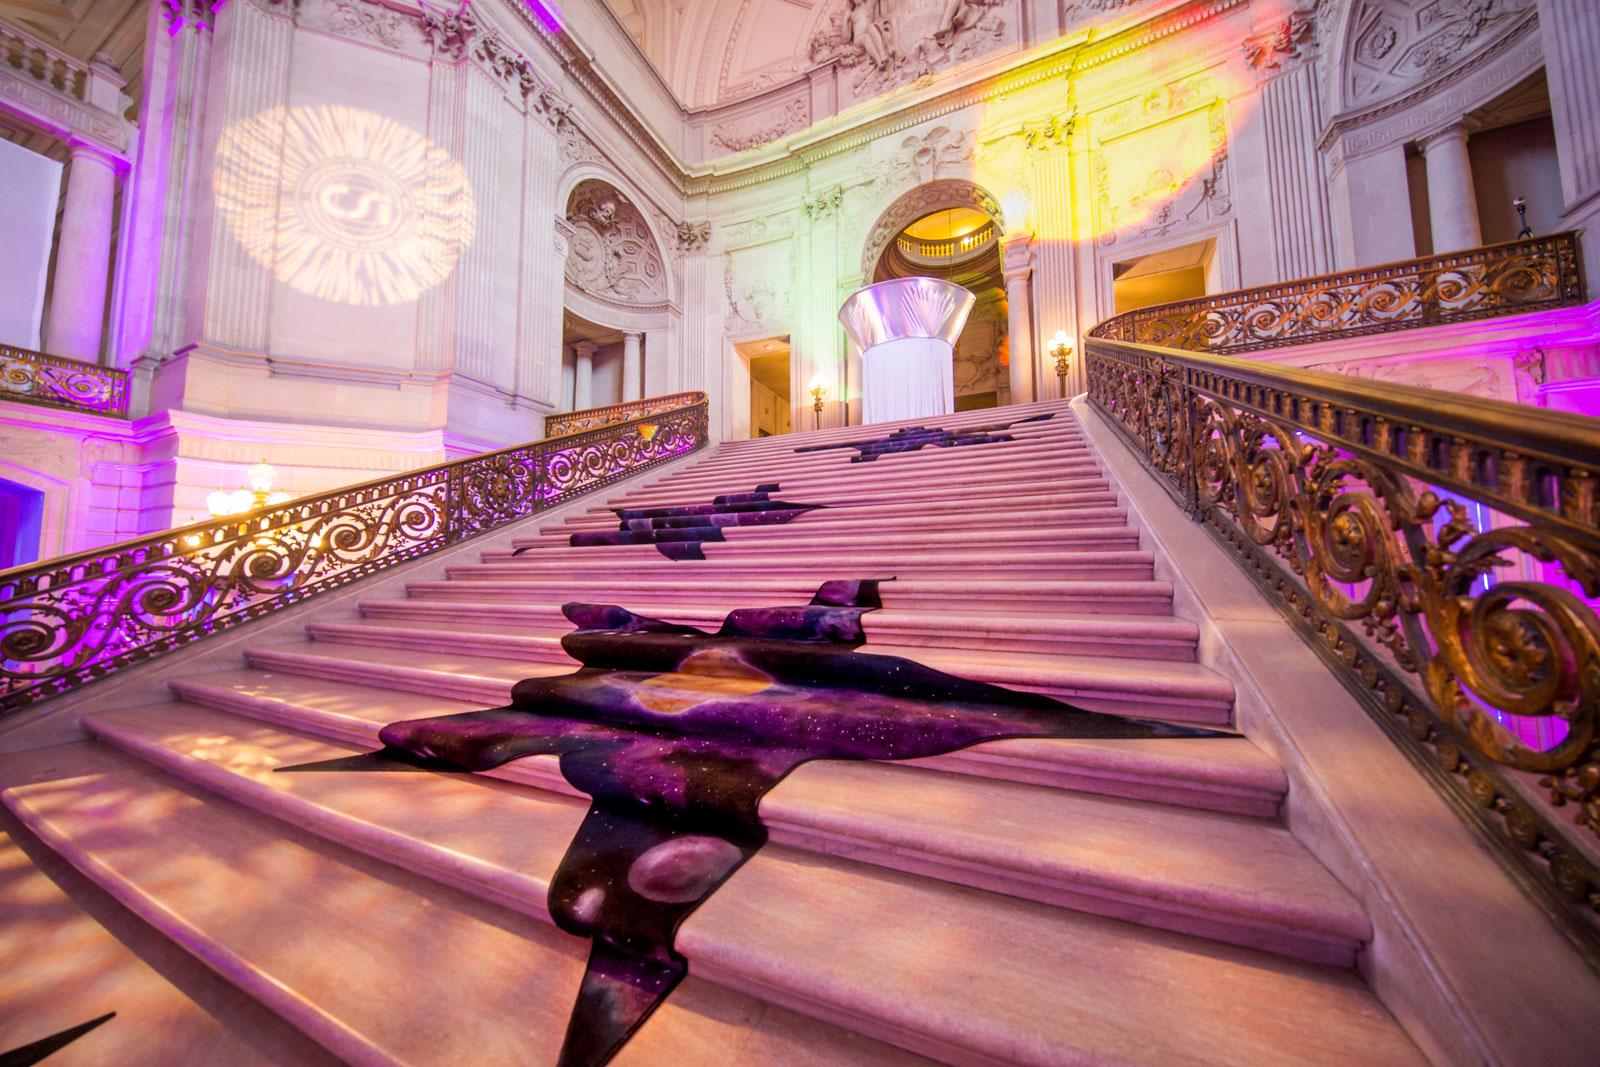 everything-audio-visual-venues-city-hall-16.jpg